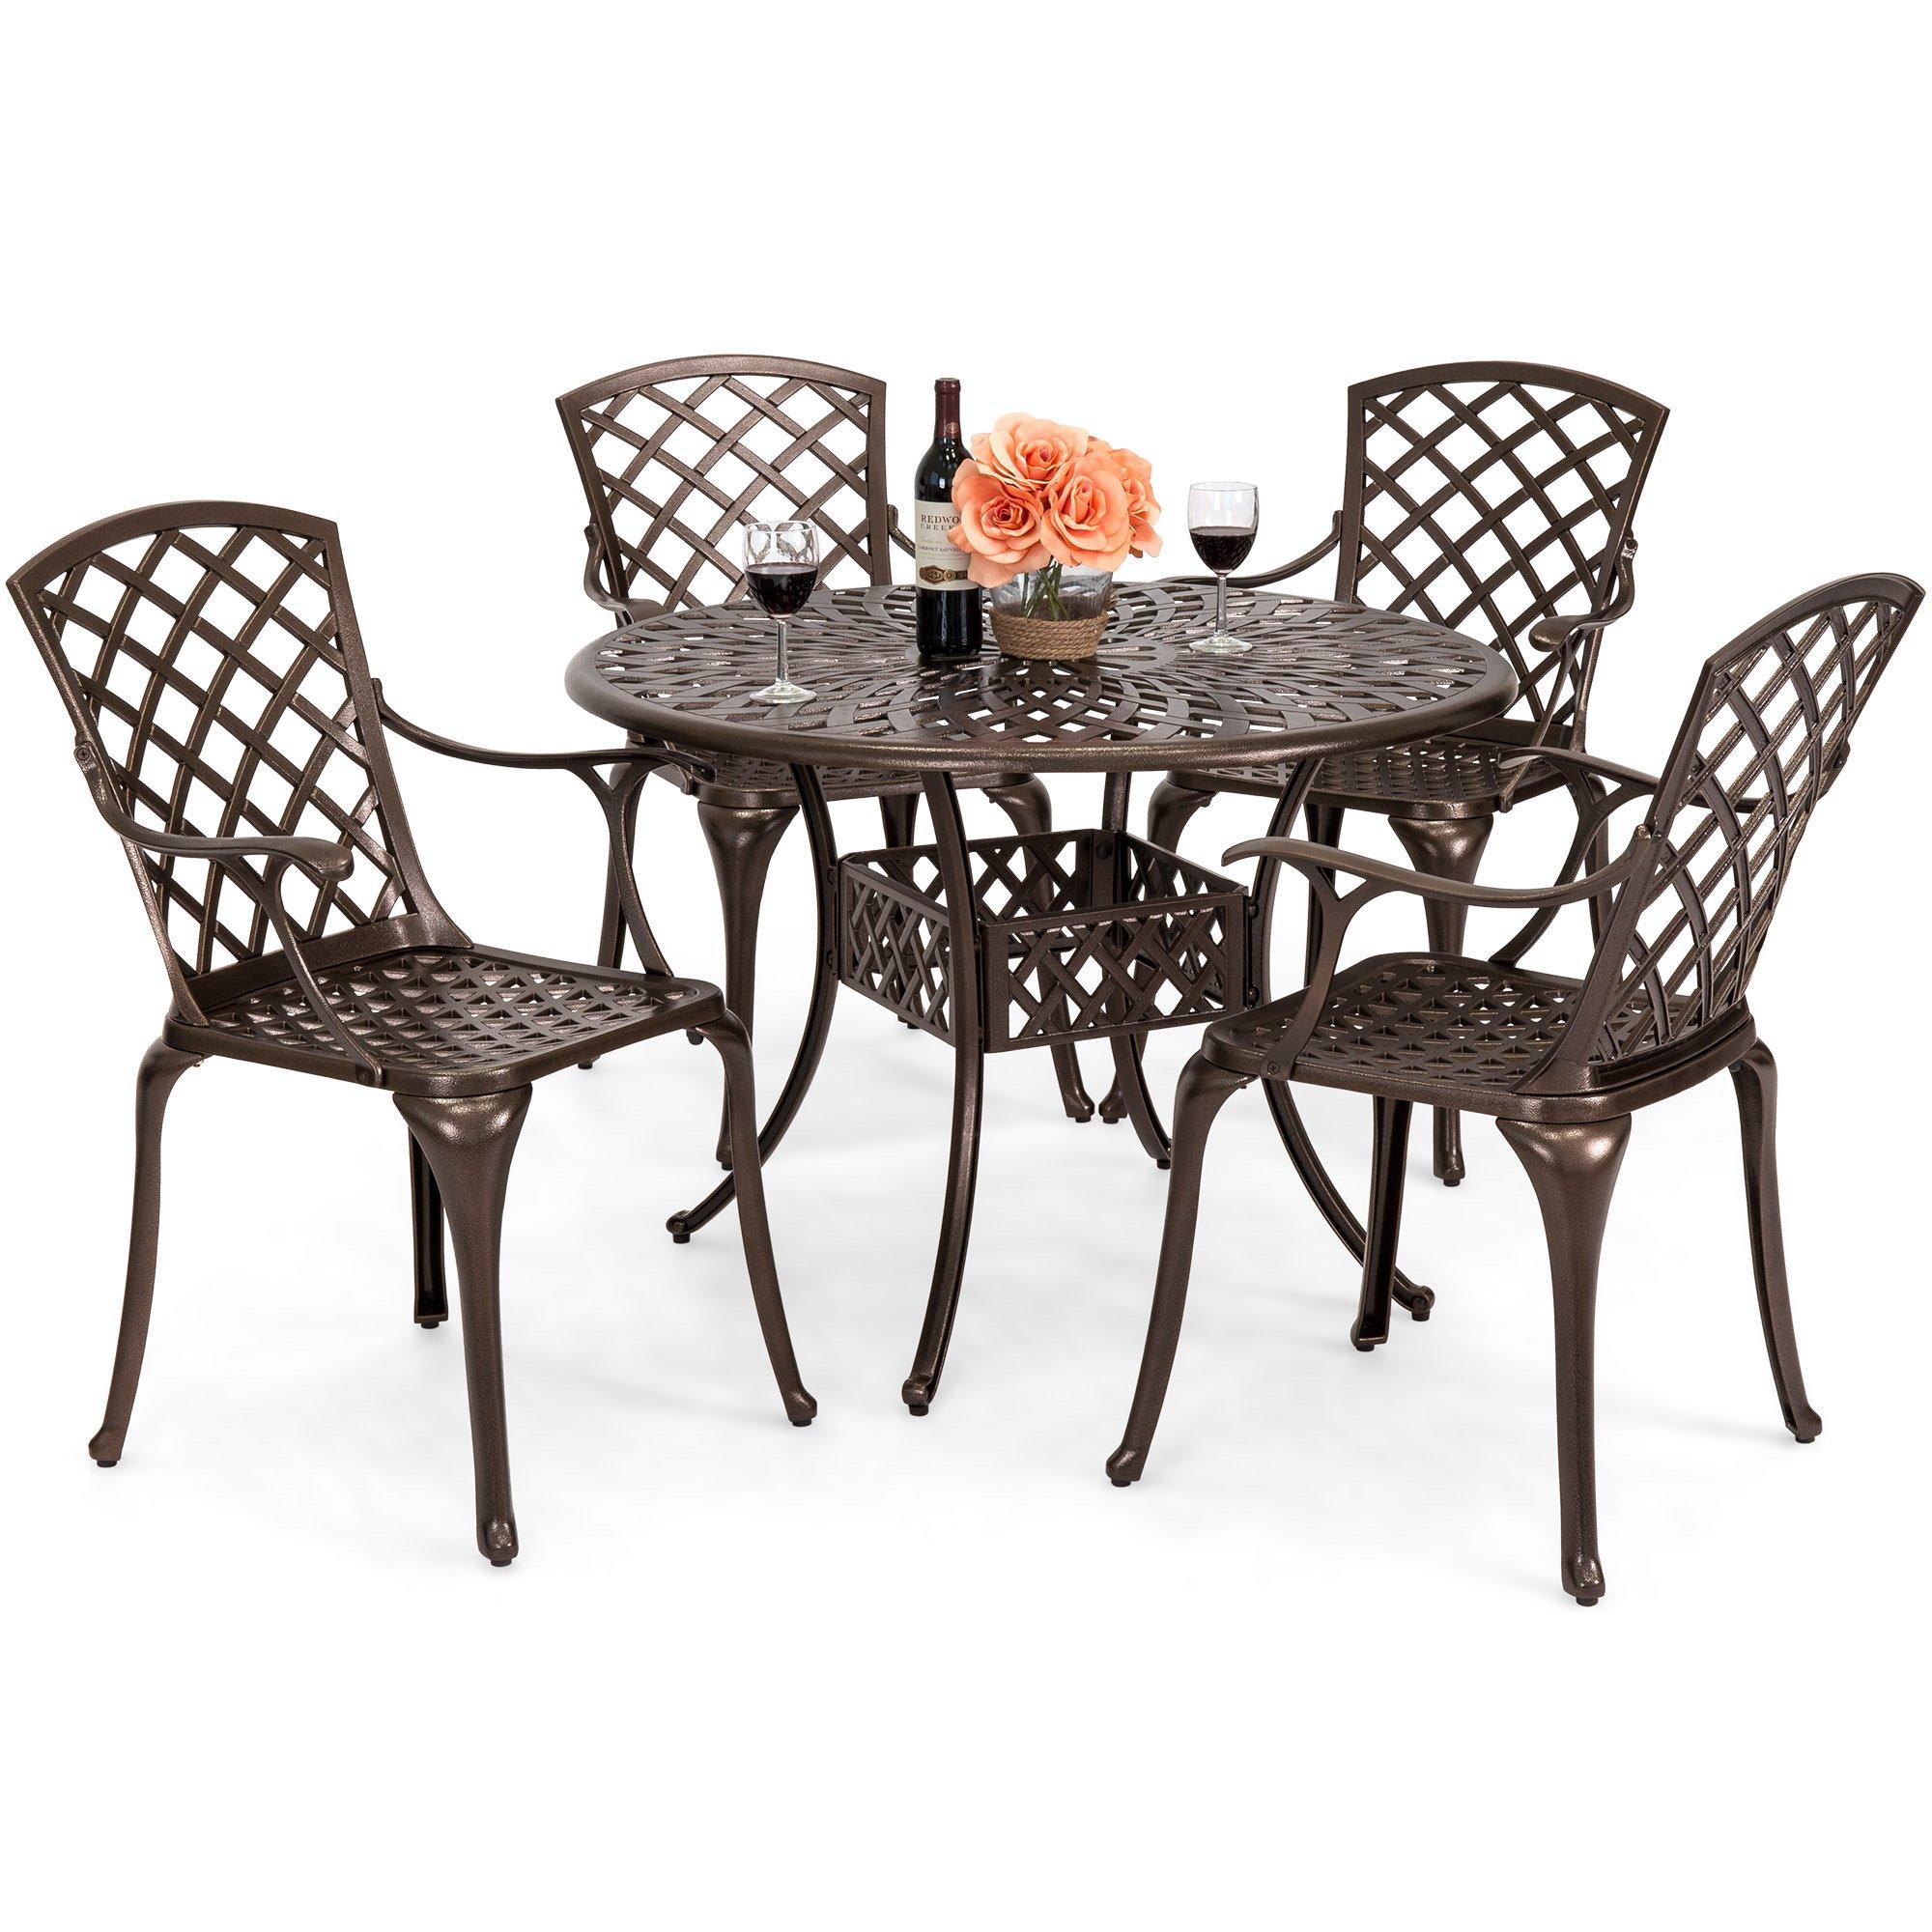 Best Choice Products 5-Piece Cast Aluminum Patio Dining Set w/ 4 Chairs, Umbrella Hole, Lattice Weave Design - Brown